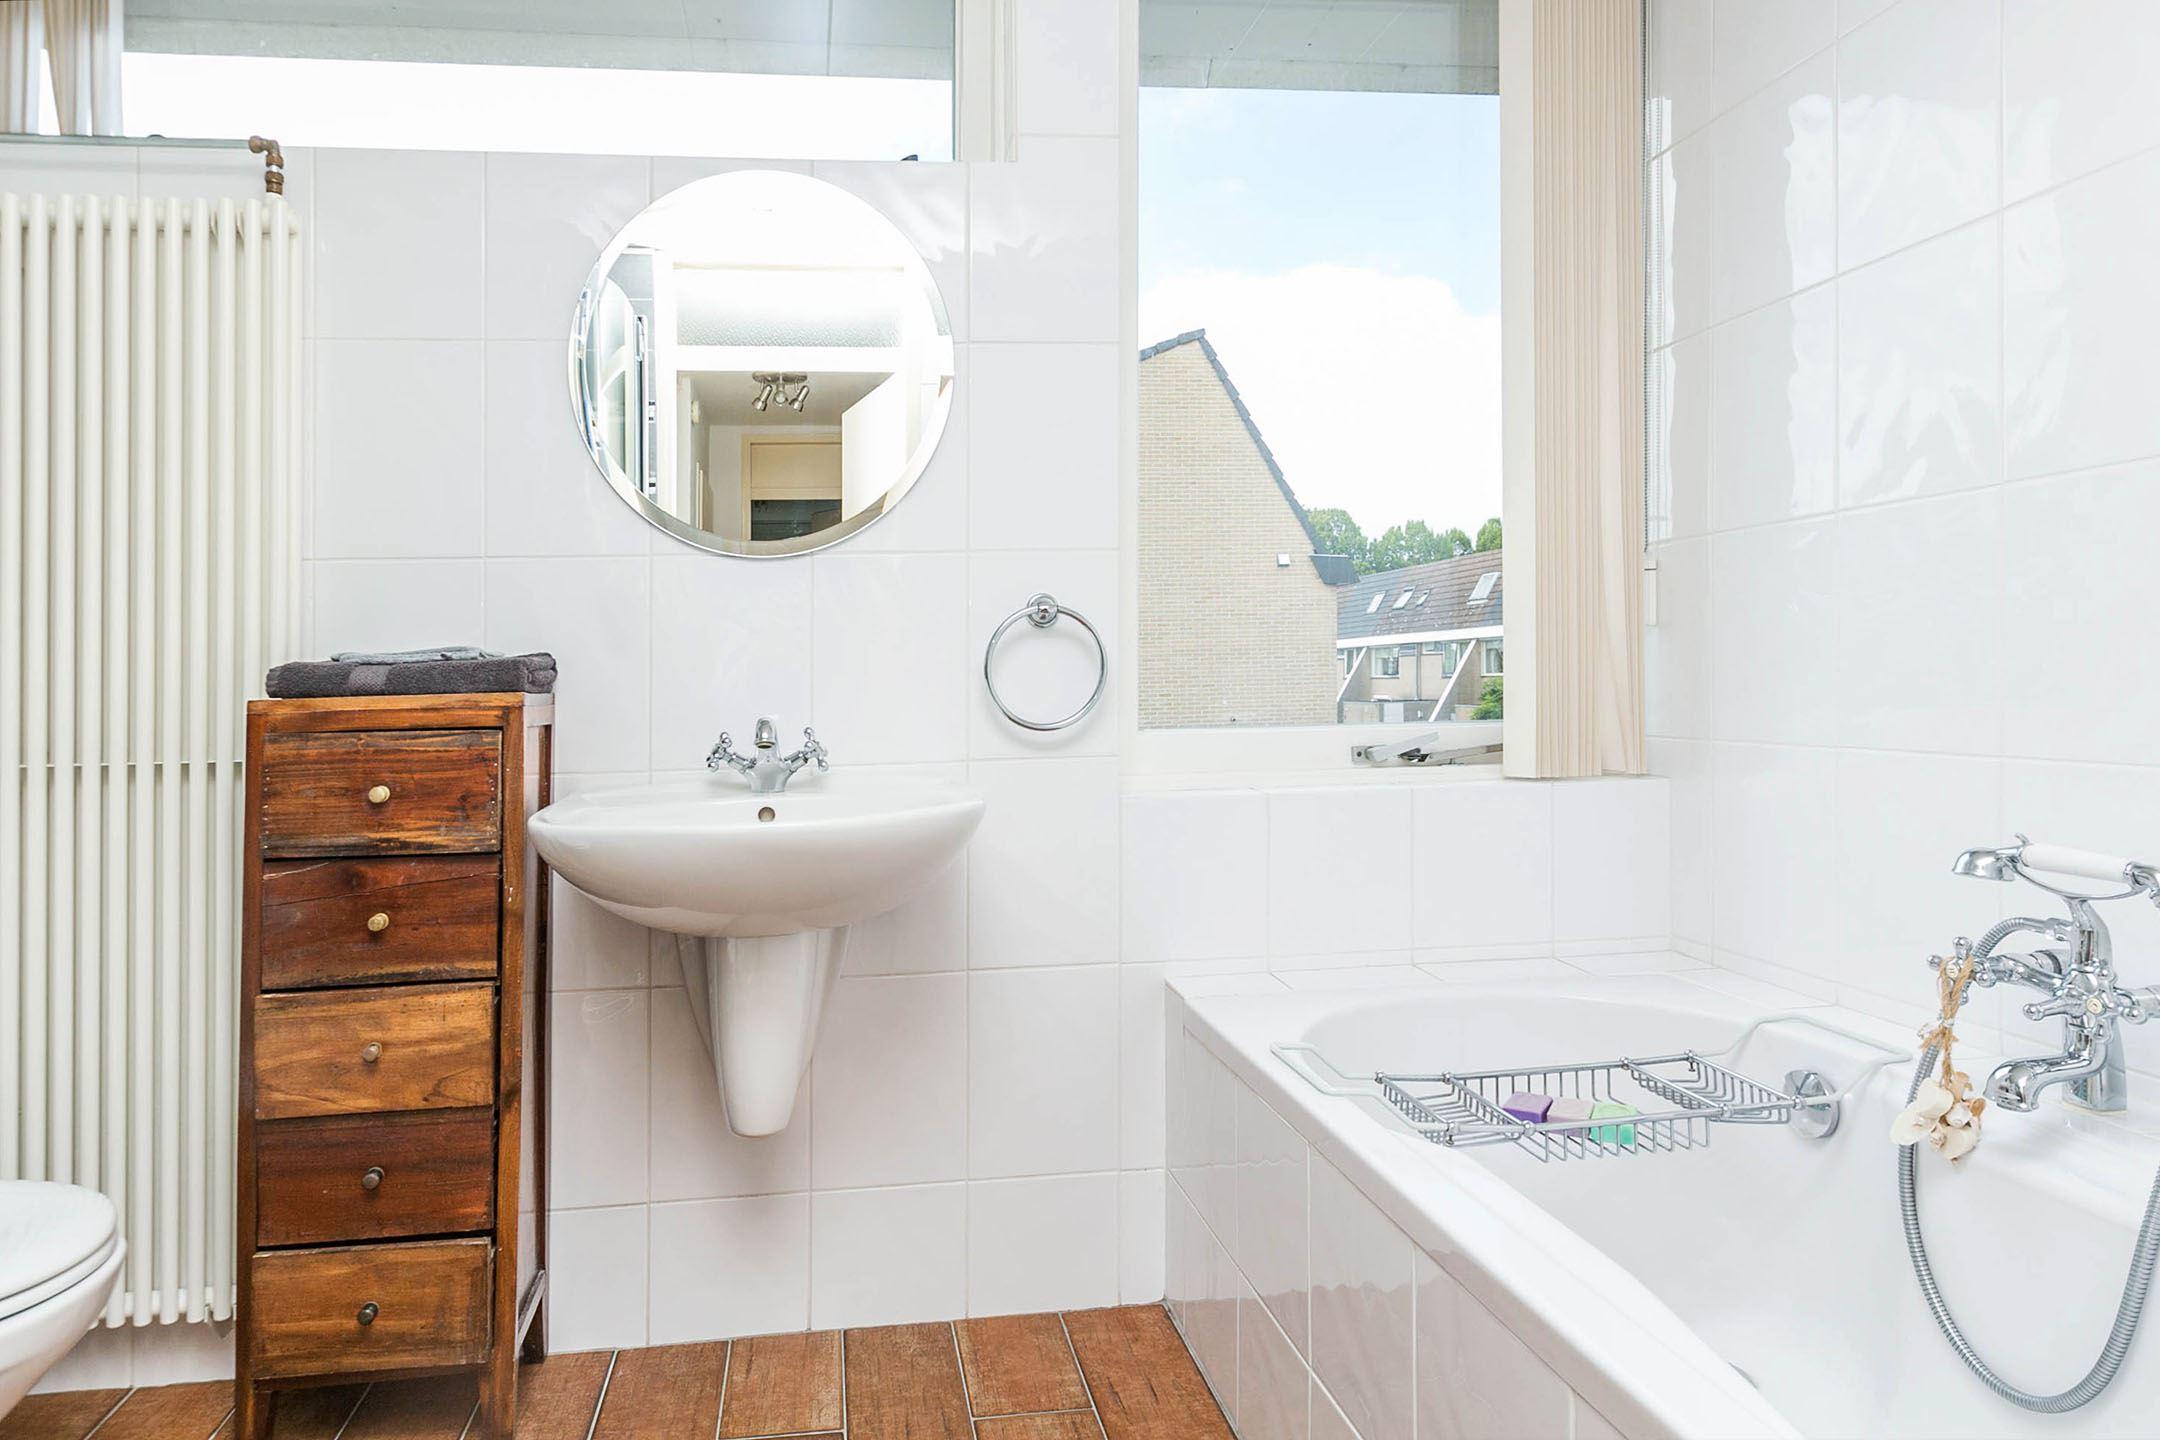 Huis te koop: Staringstraat 92 5343 GJ Oss [funda]